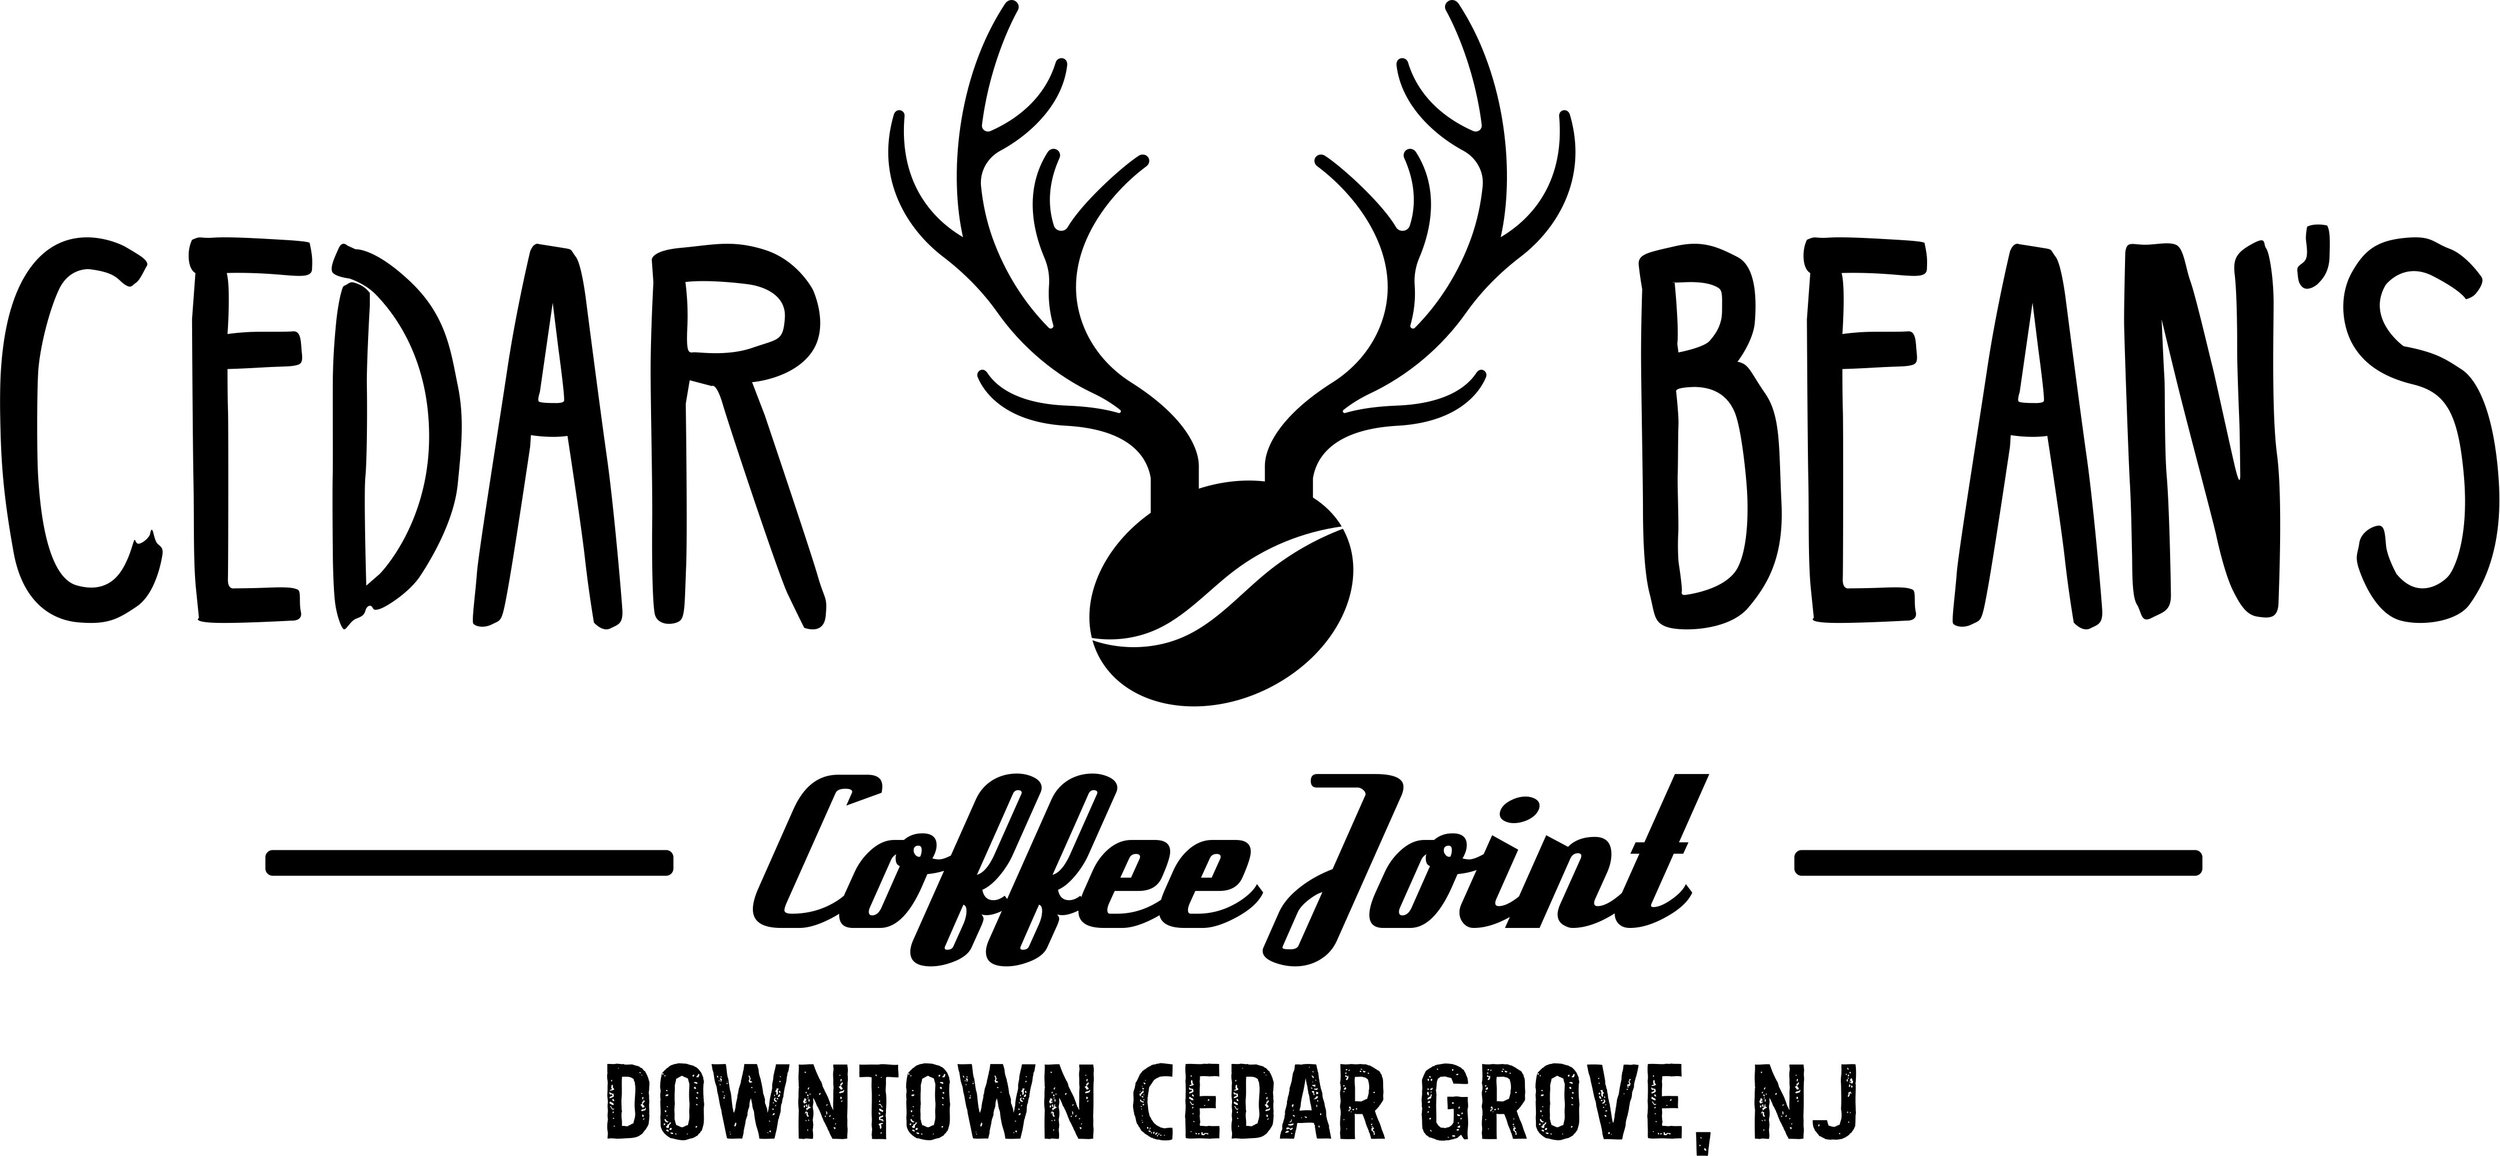 cedar-beans-coffee-joint-bw 2.jpg